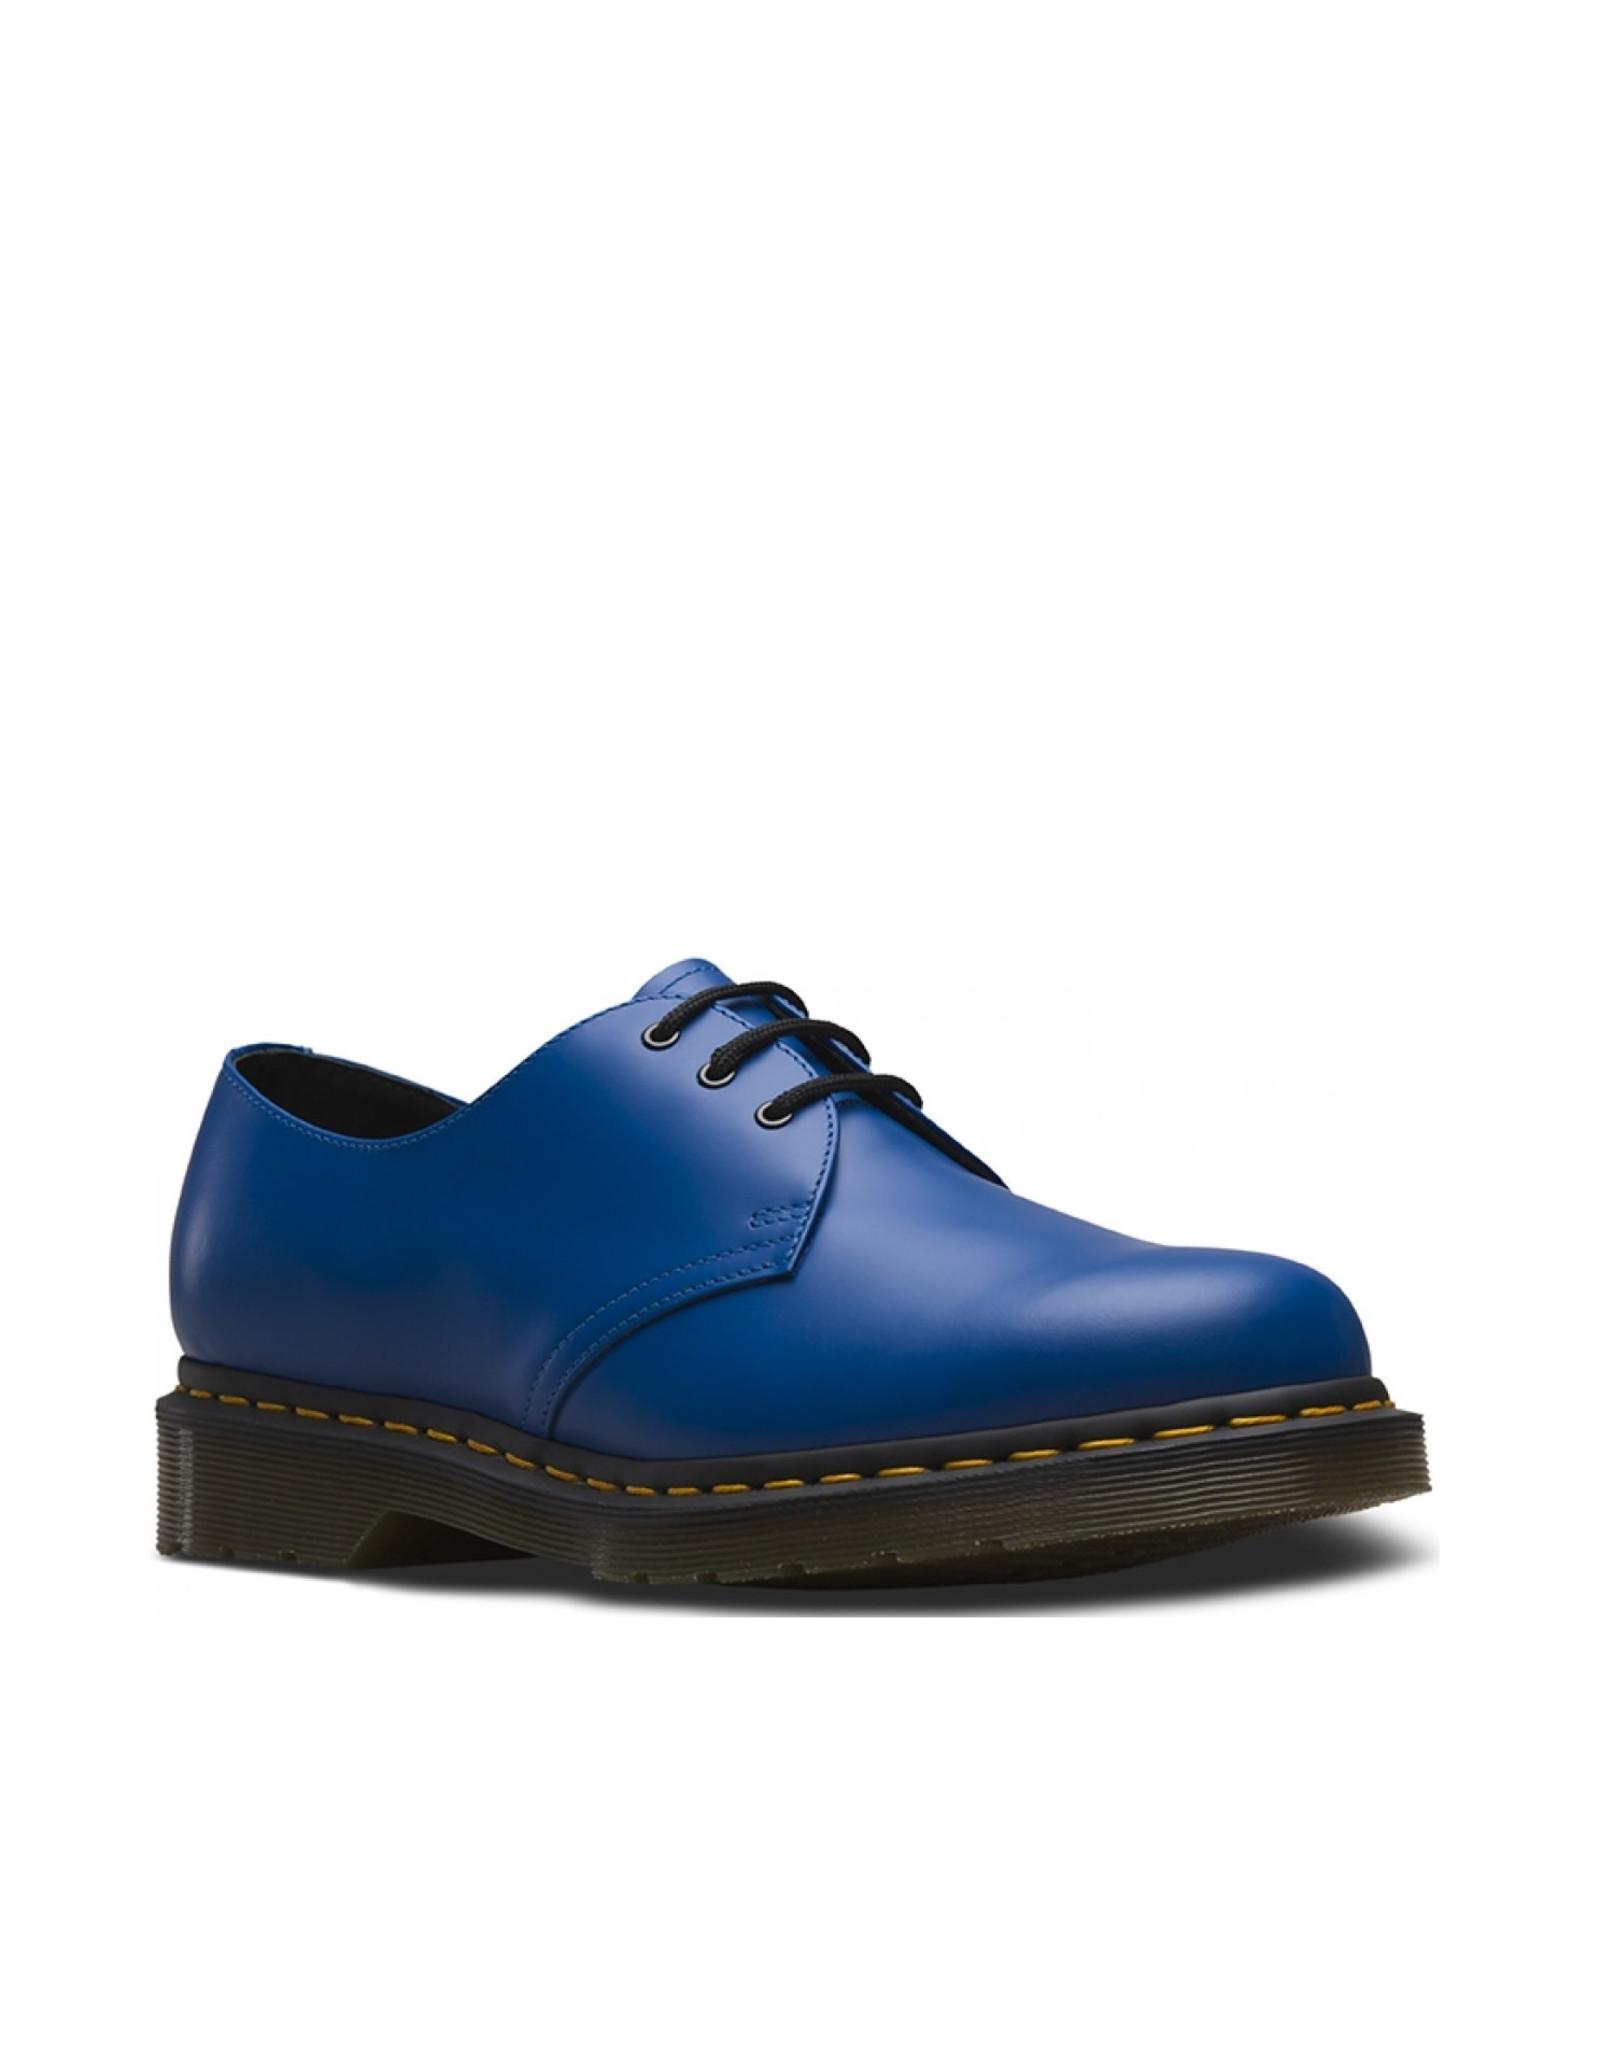 DR. MARTENS 1461 SMOOTH BLUE 301BLU-R24616400